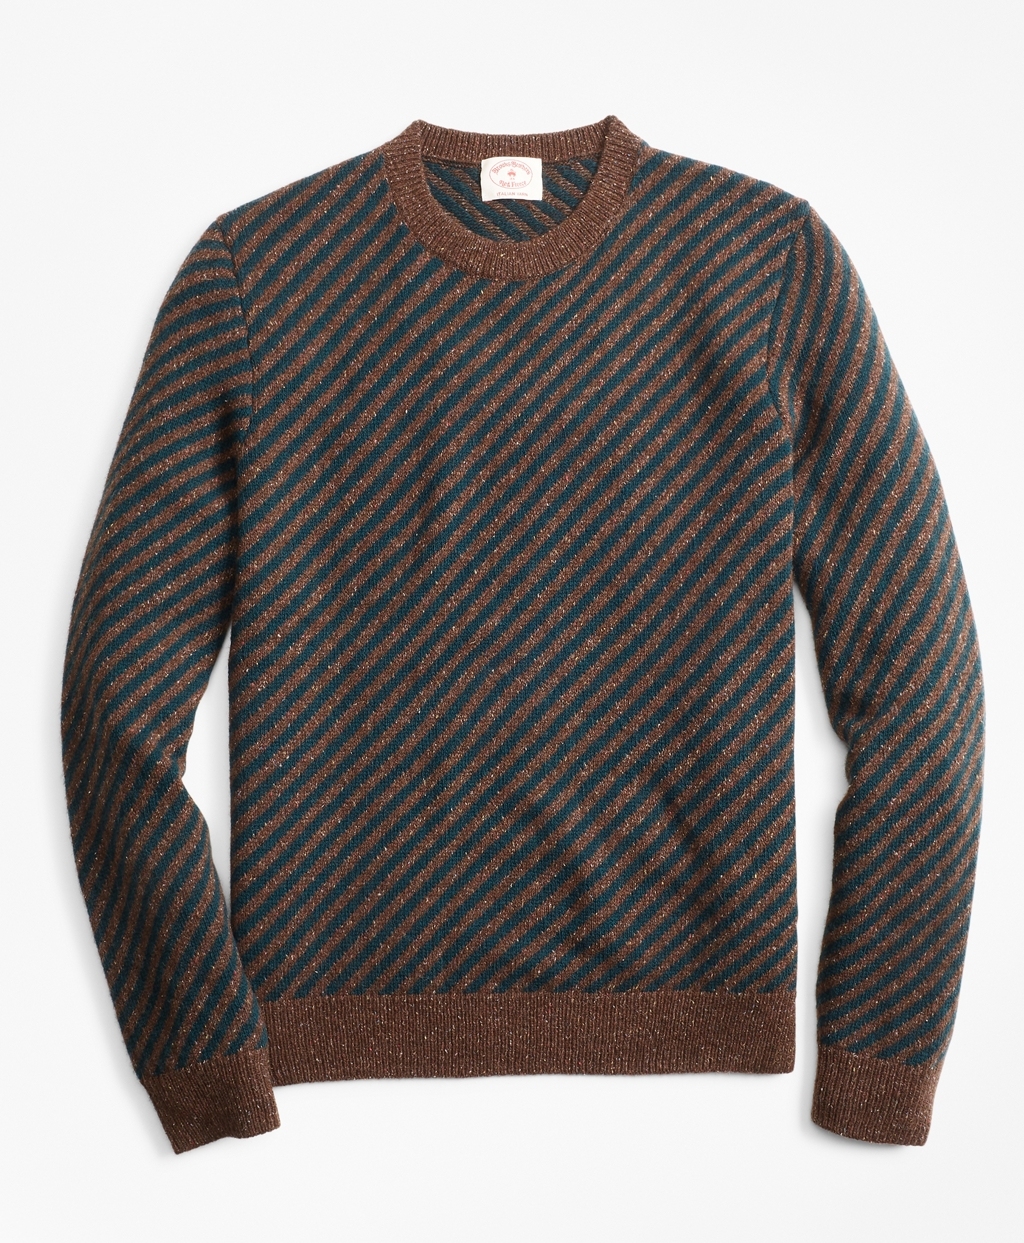 1960s Men's Clothing, 70s Men's Fashion Brooks Brothers Mens Diagonal-Stripe Alpaca-Blend Crewneck Sweater $89.50 AT vintagedancer.com